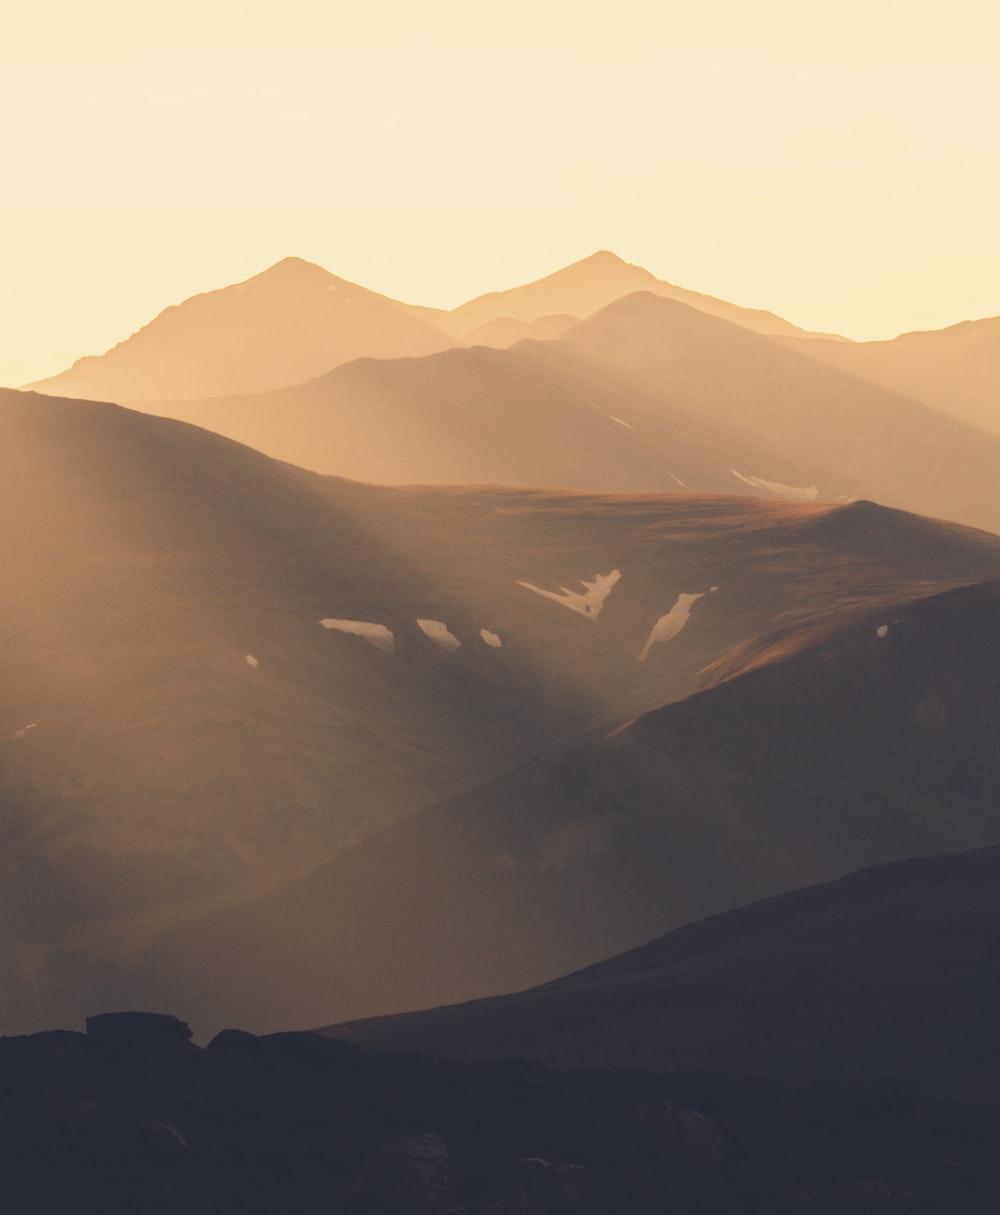 sun shining over mountain ranges